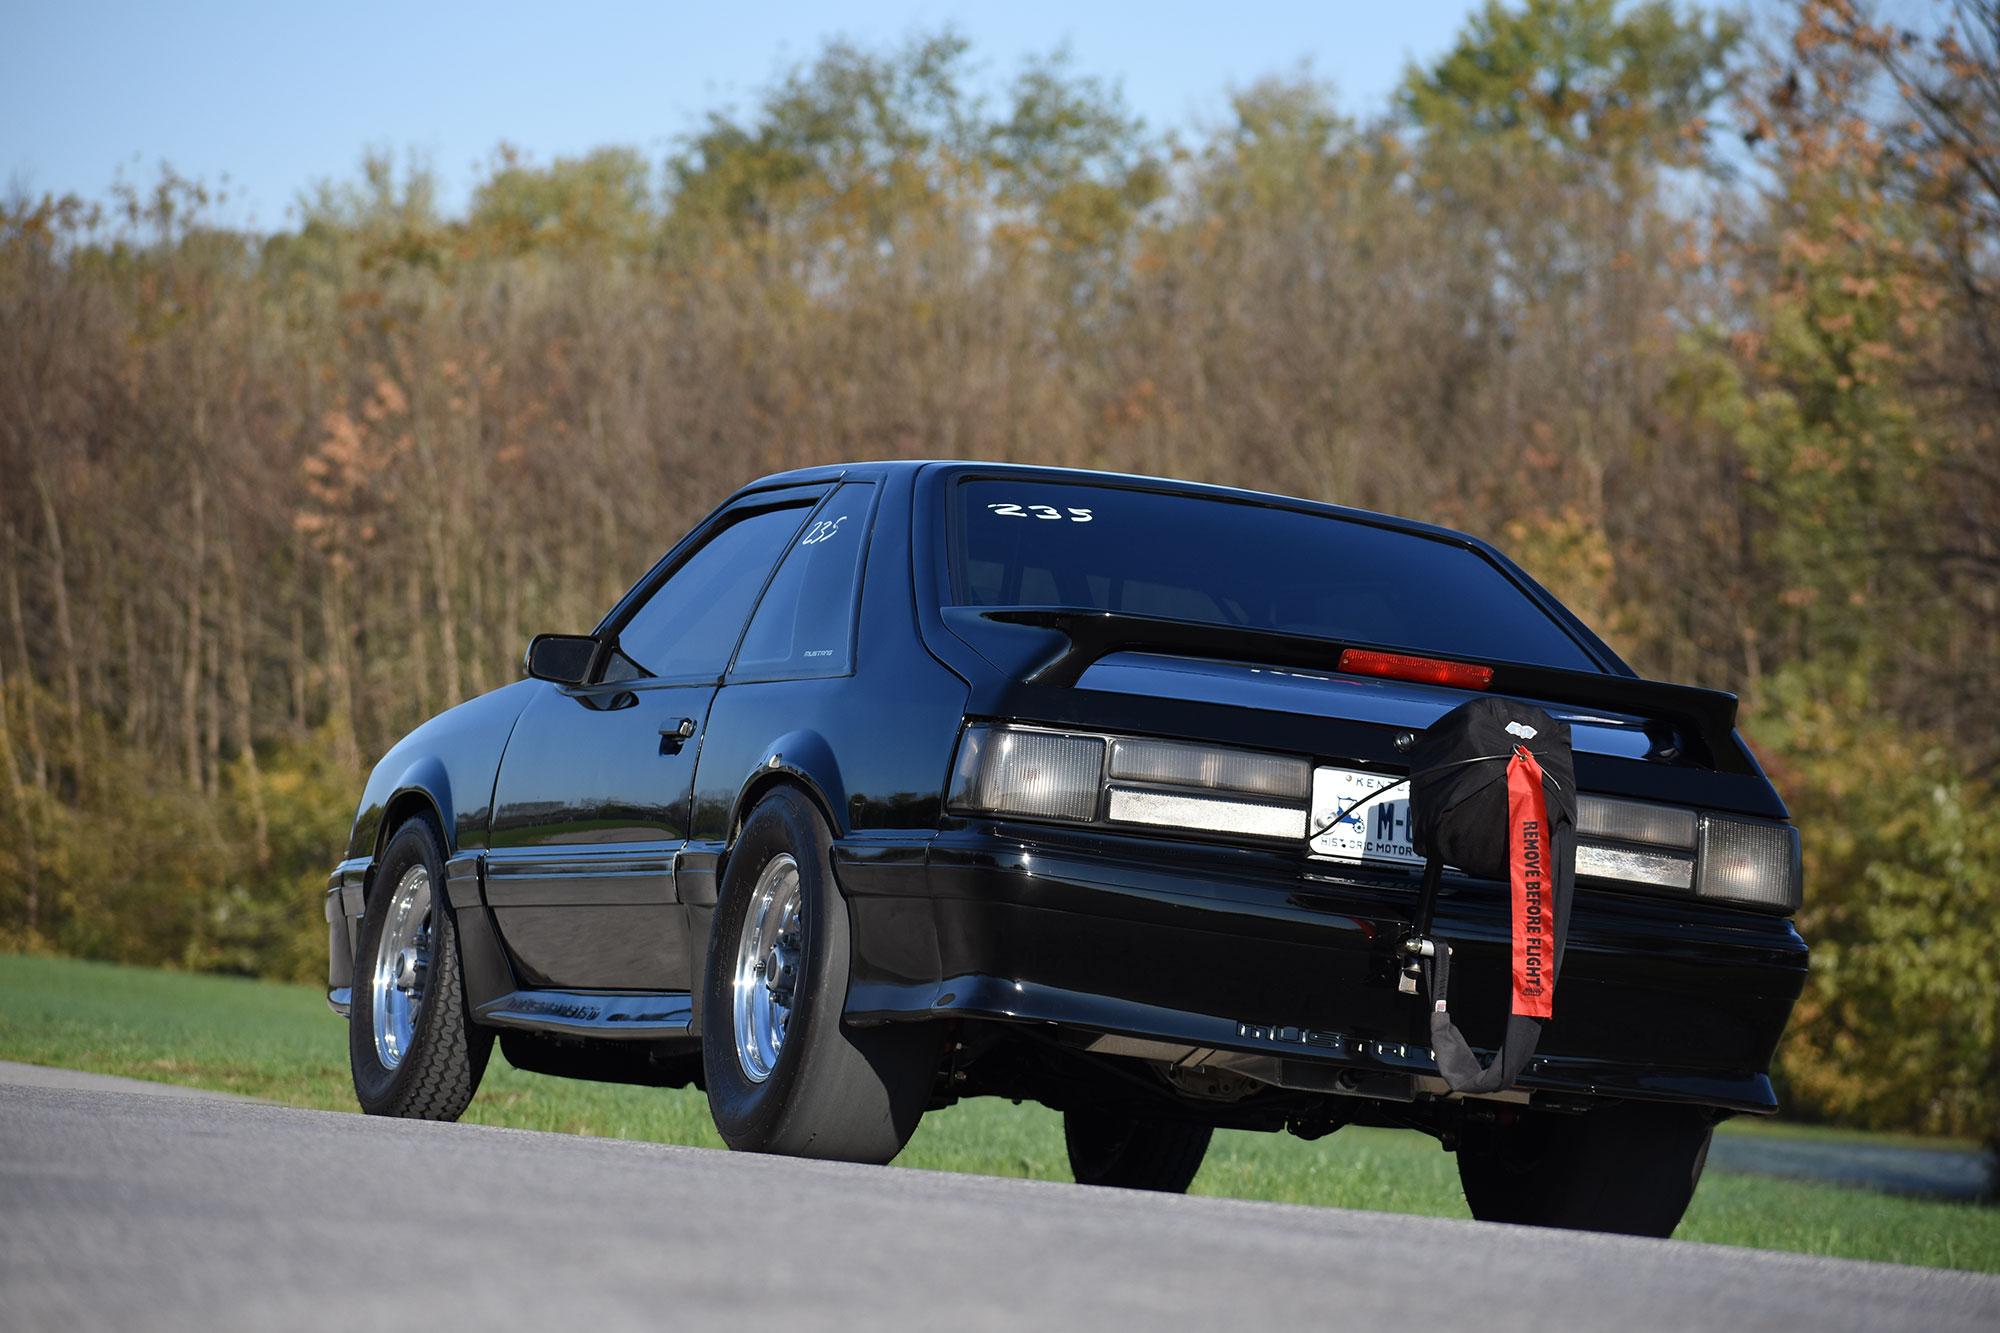 1988 Fox-body Mustang race car rear